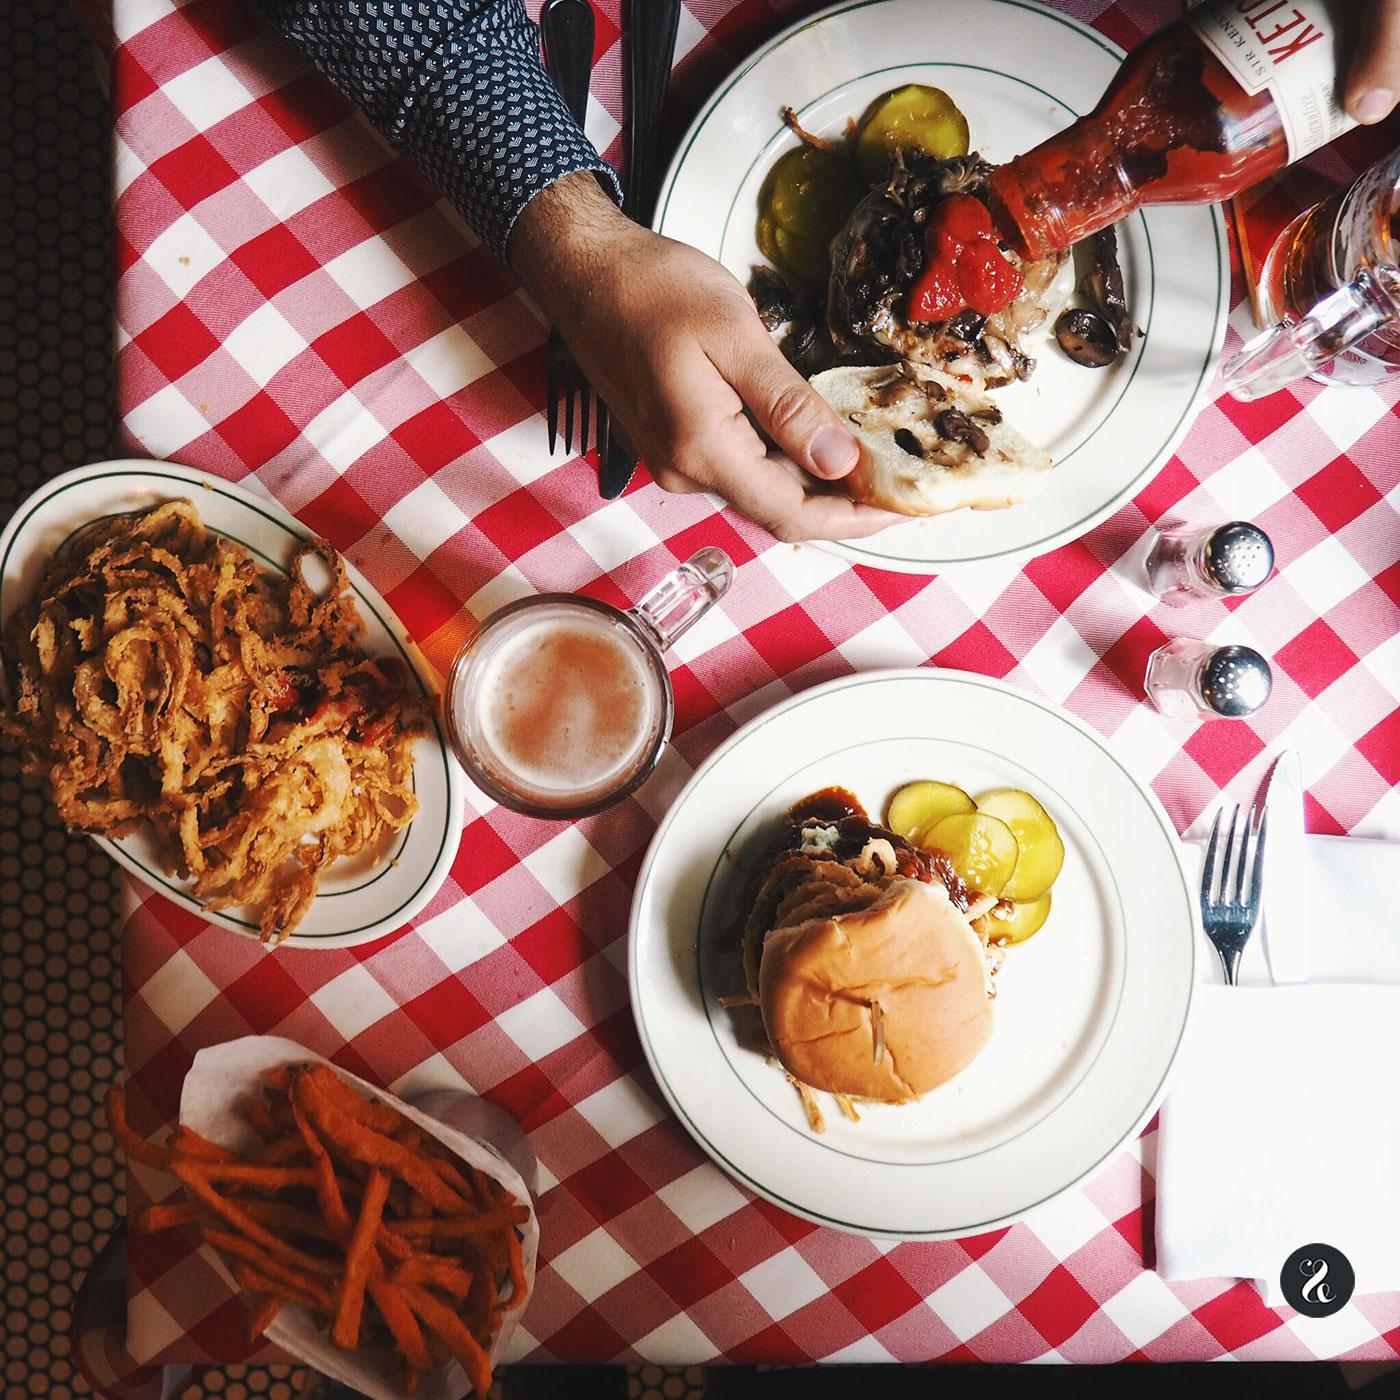 Visitar PJ Clarks es imprescindible para vivir una auténtica experiencia hamburguesera newyorquina